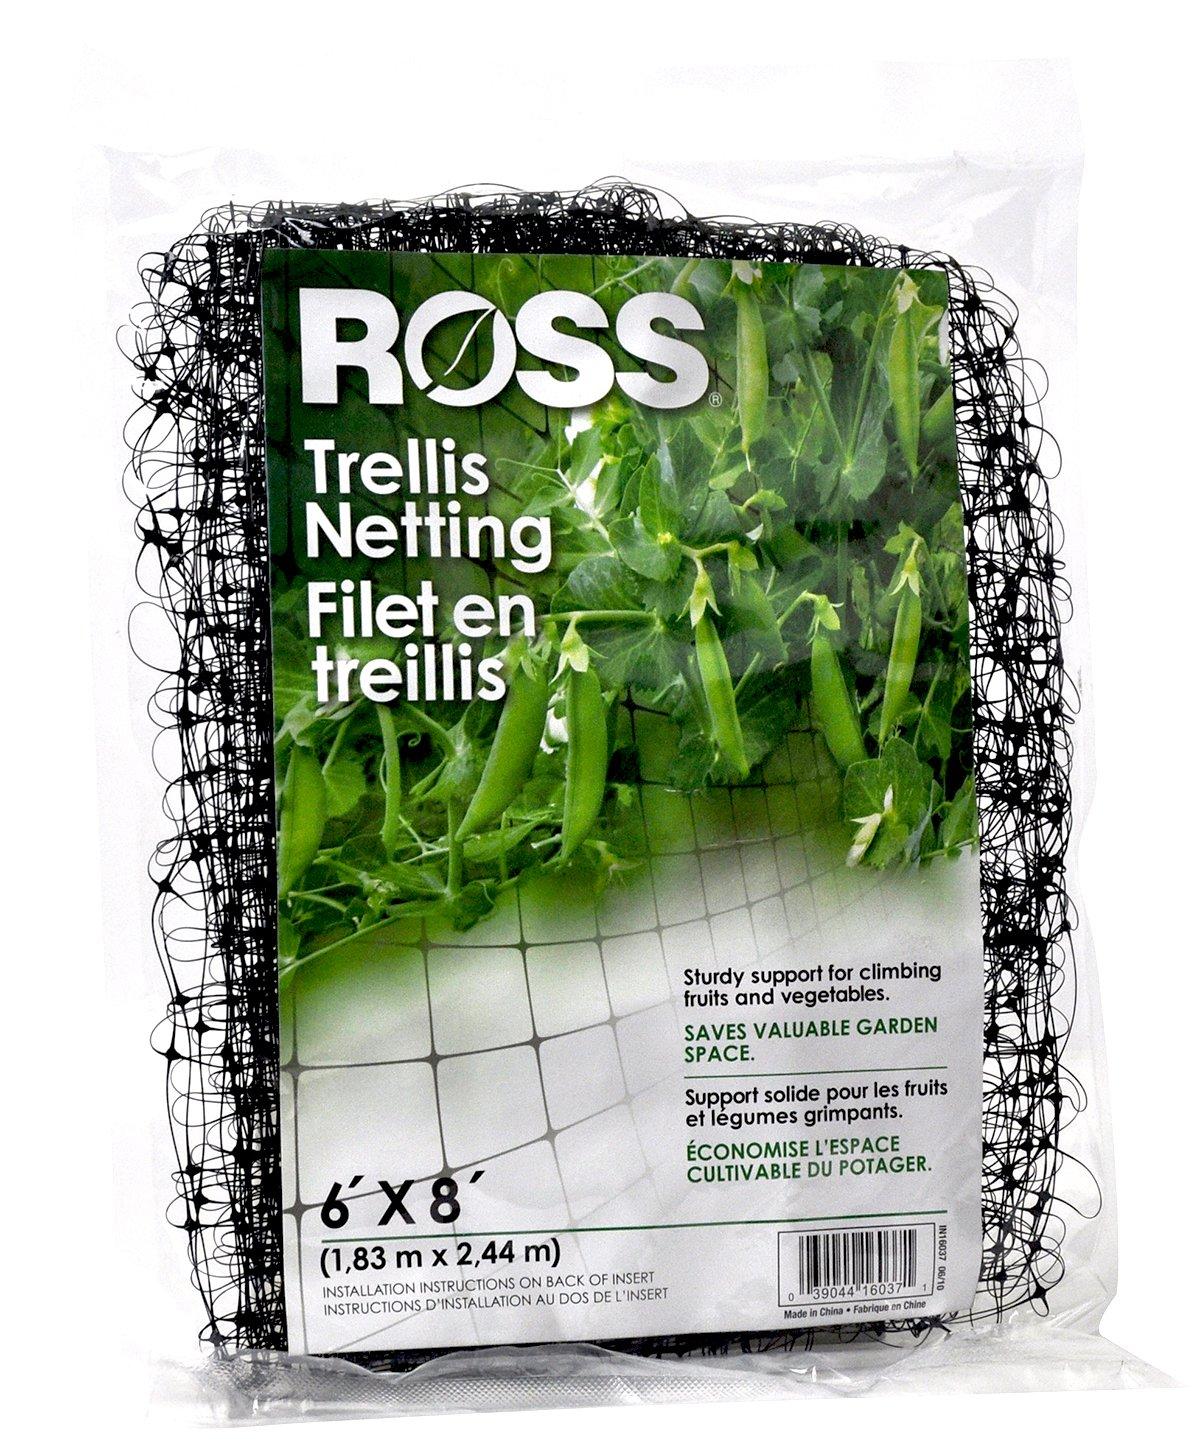 Ross Trellis Netting (Support for Climbing, Fruits, Vegetables and Flowers) Black Garden Netting, 6 feet x 8 feet (16037)